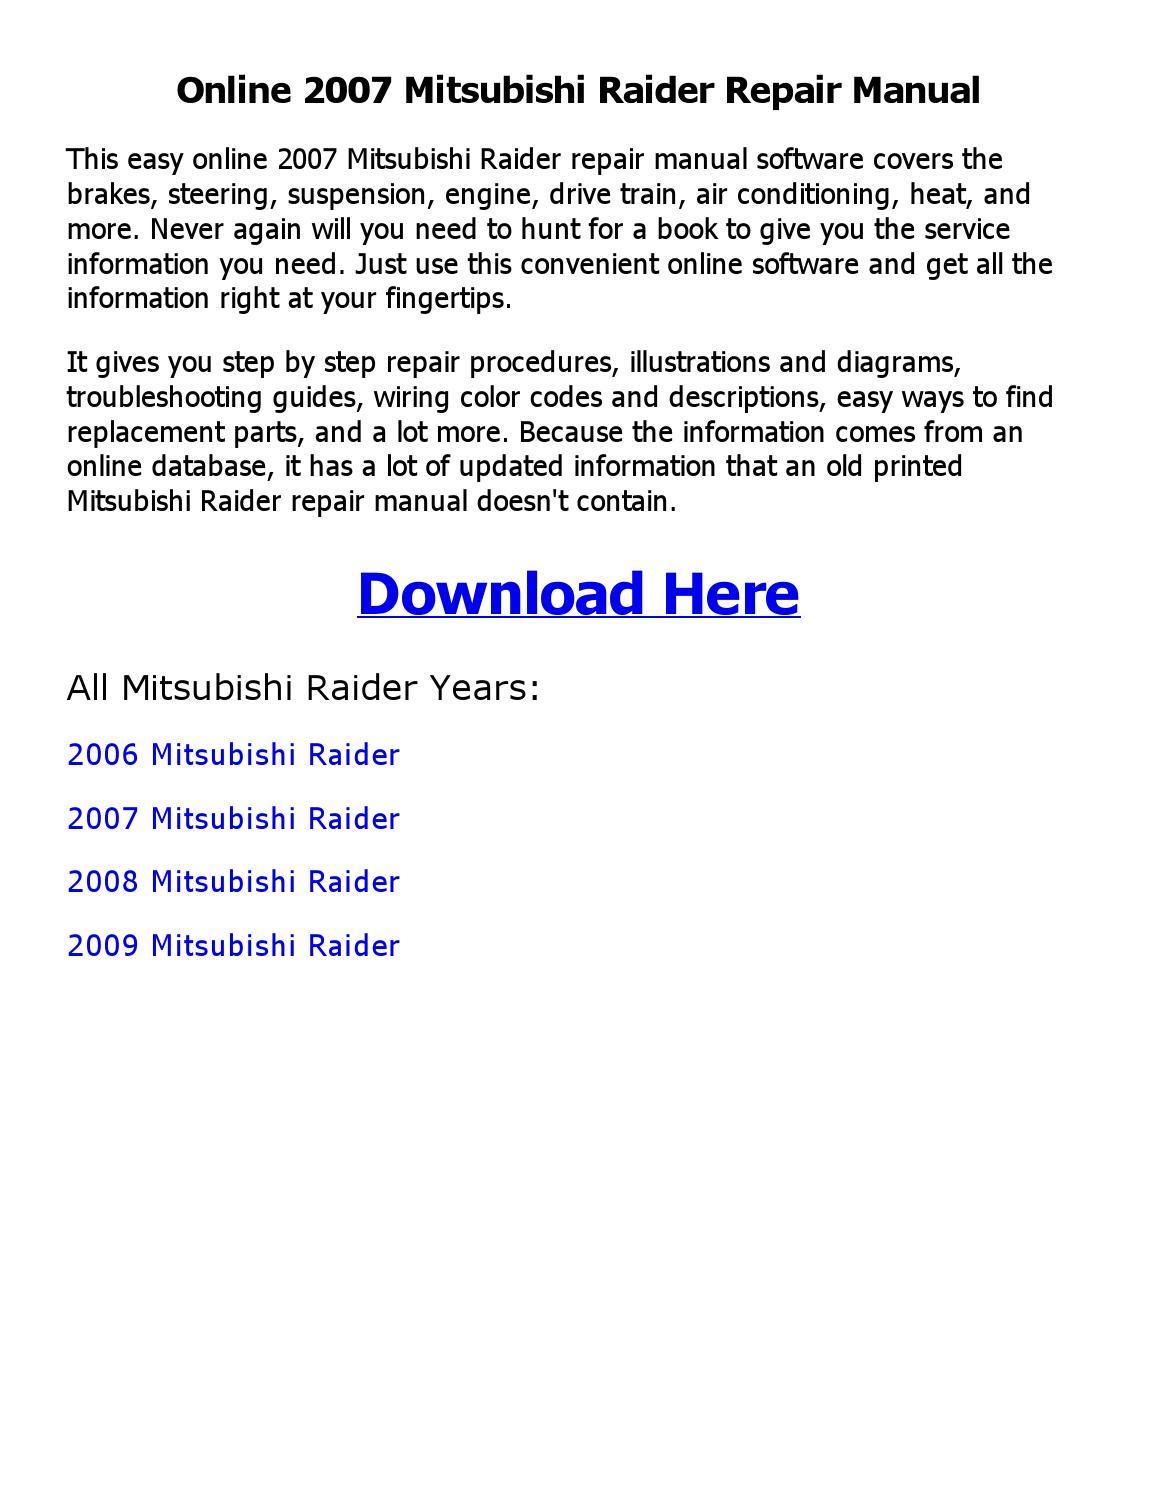 2007 mitsubishi raider repair manual online by emran ahmed - issuu